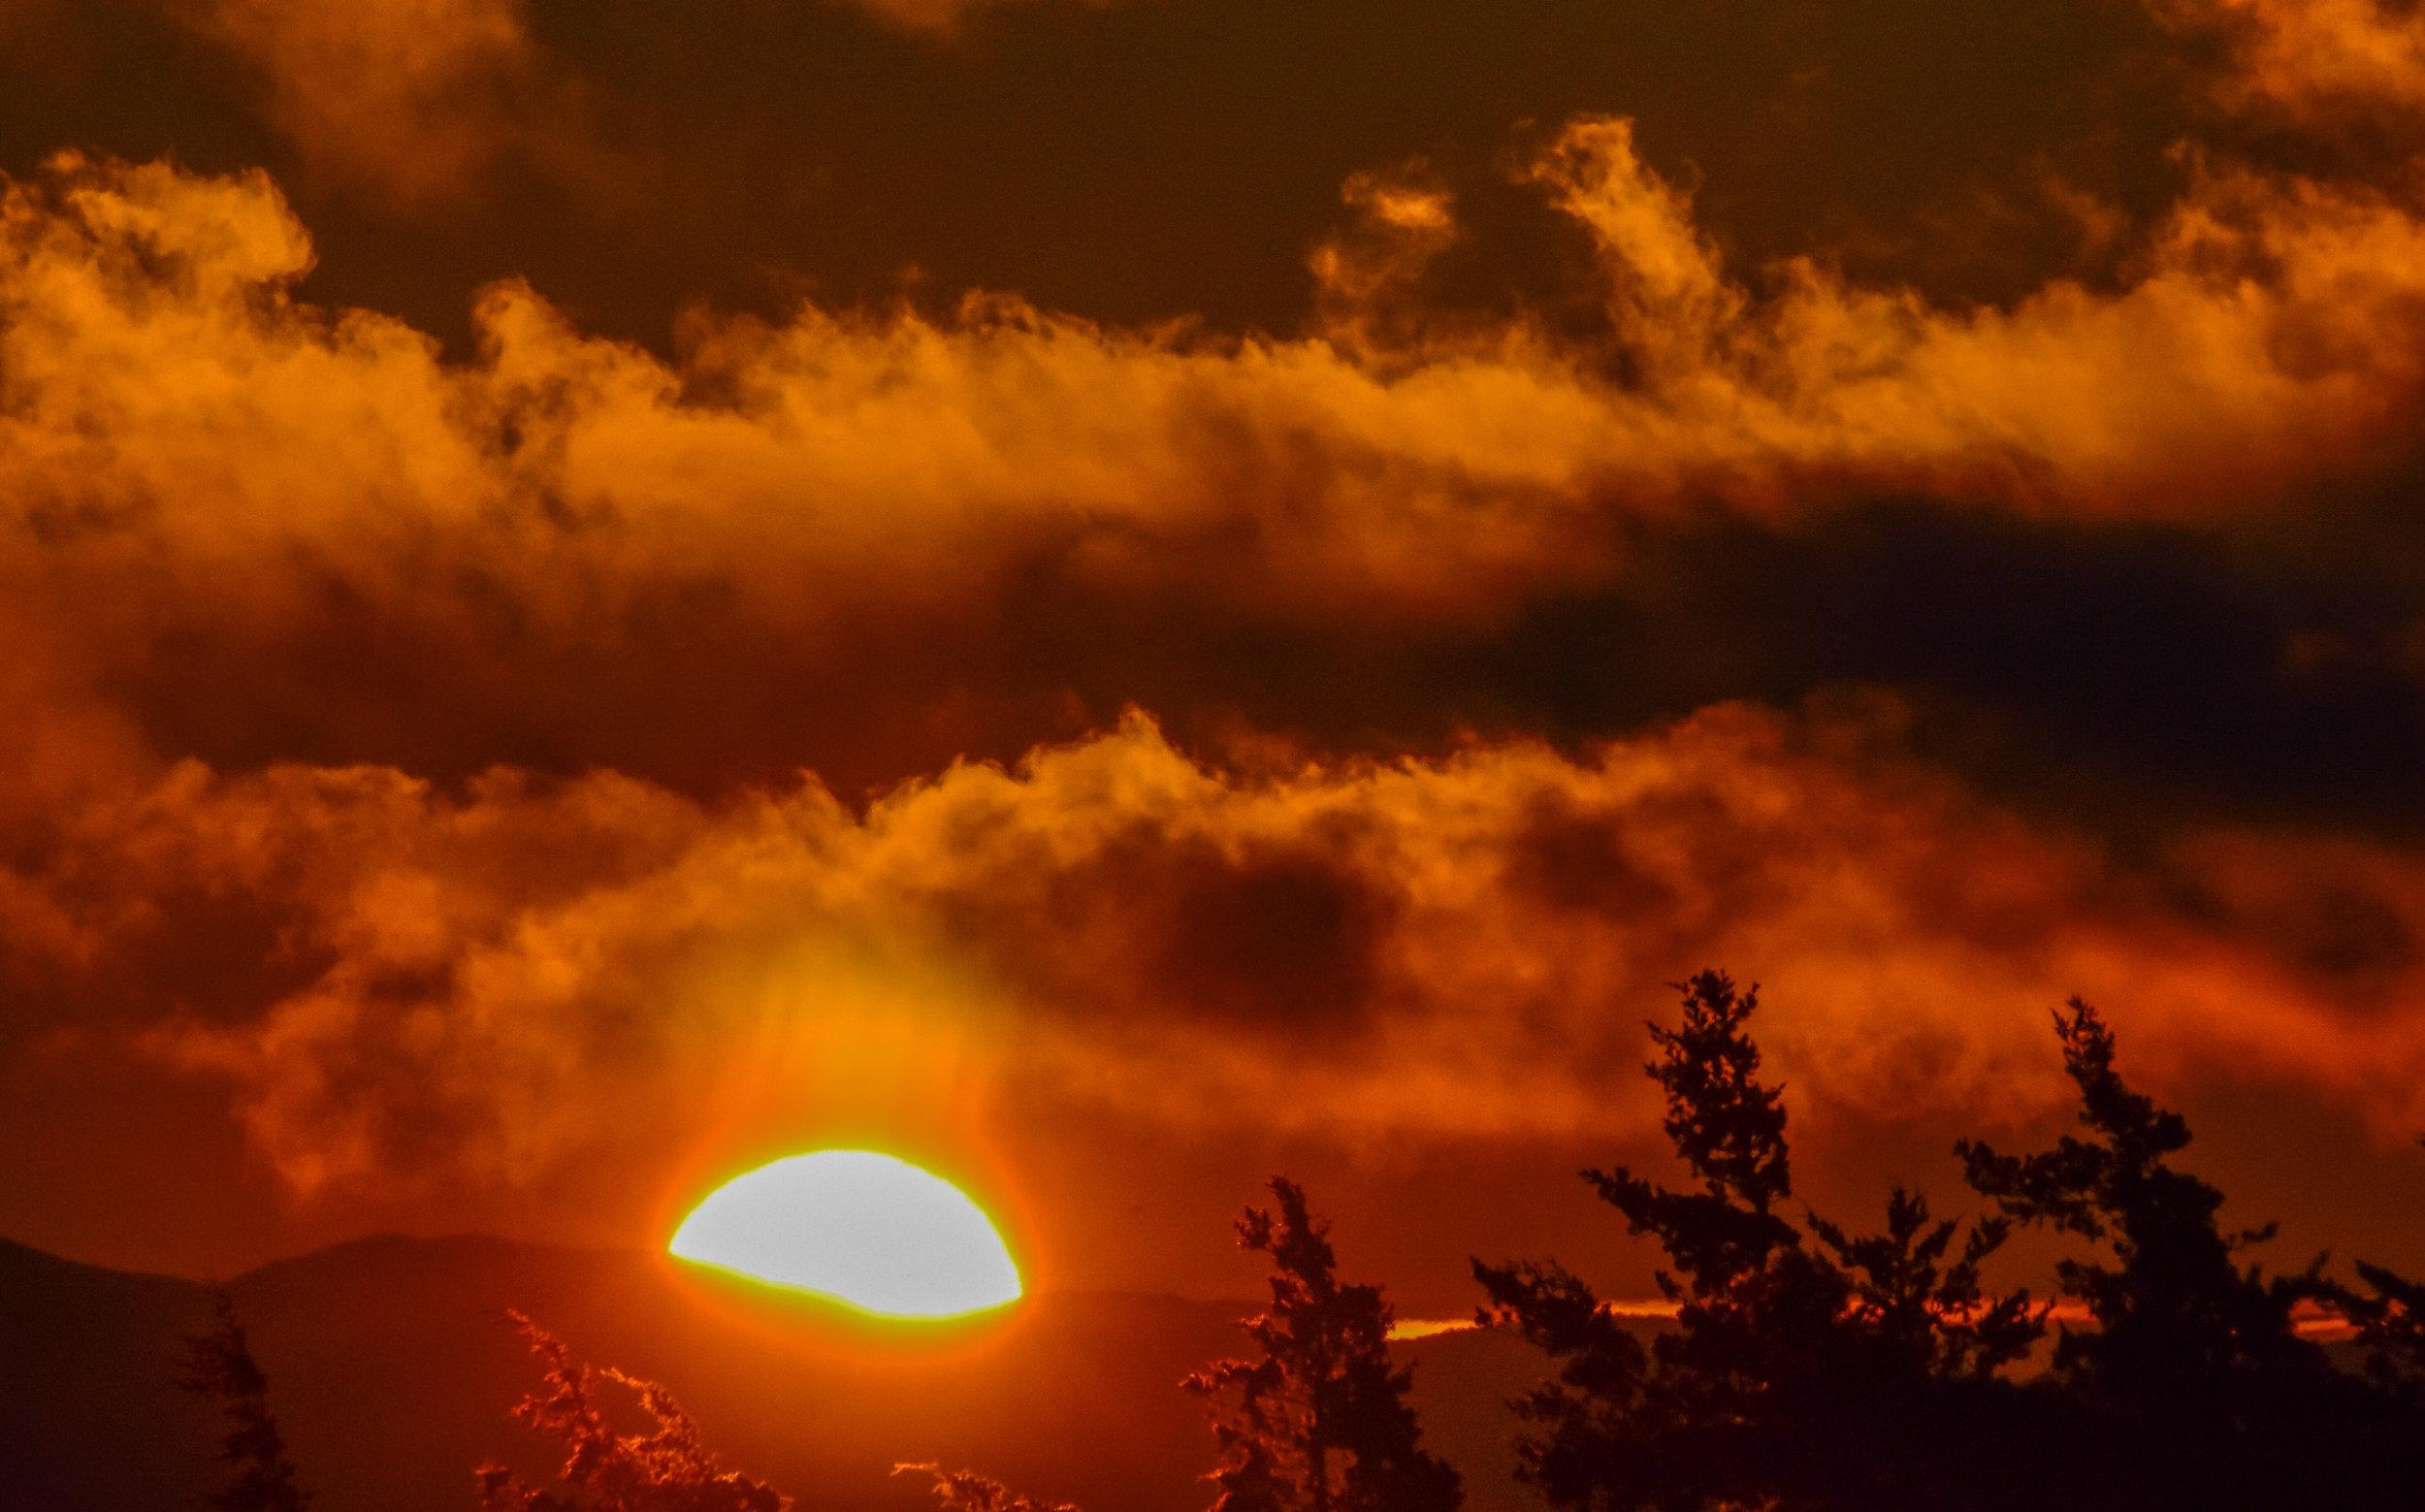 Orange Sunrise with Clouds